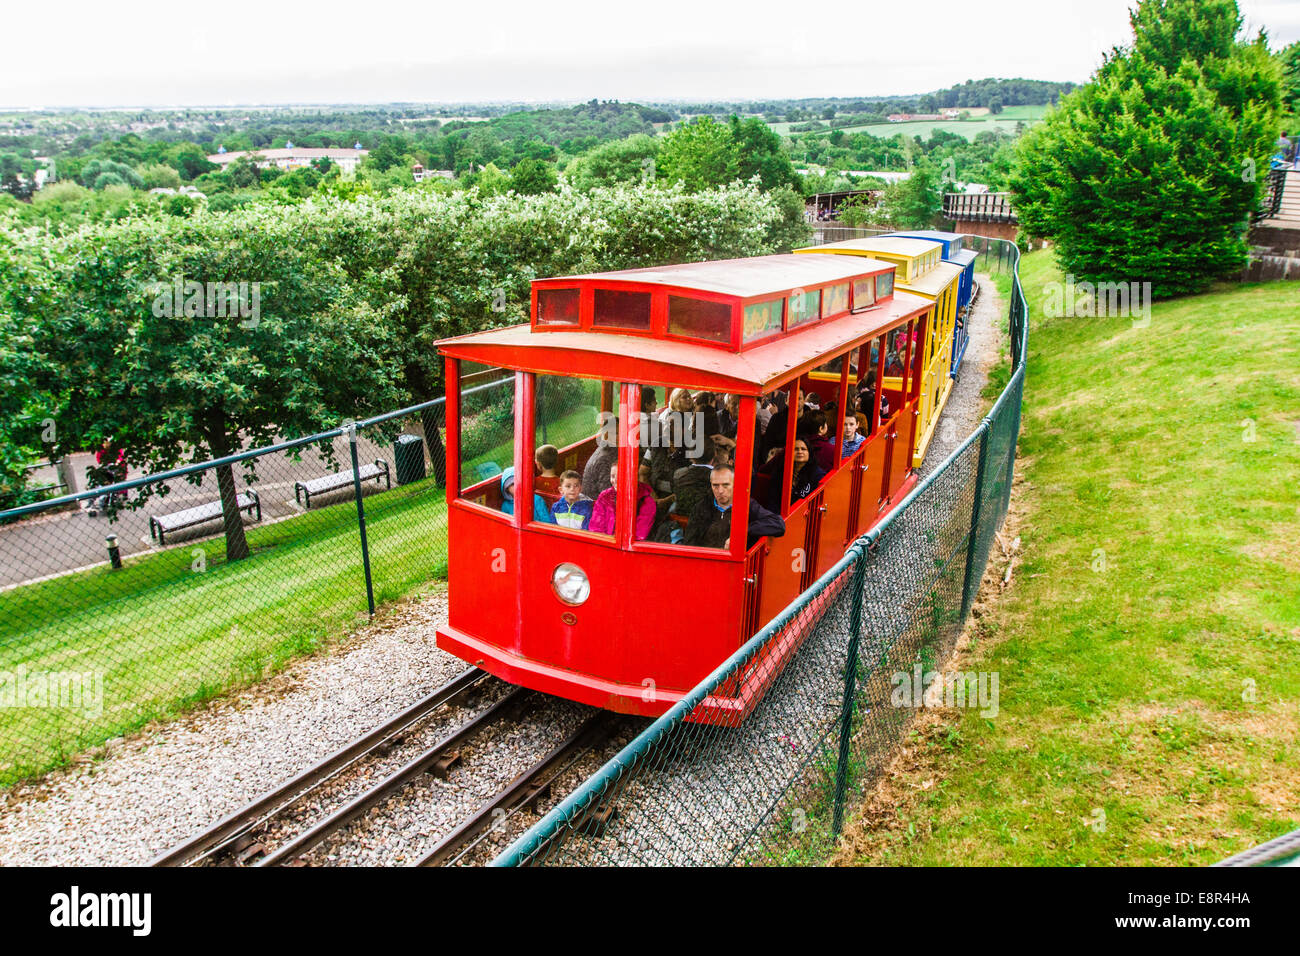 Hill train at Legoland Windsor Resort, Windsor, London, England, United Kingdom. Stock Photo